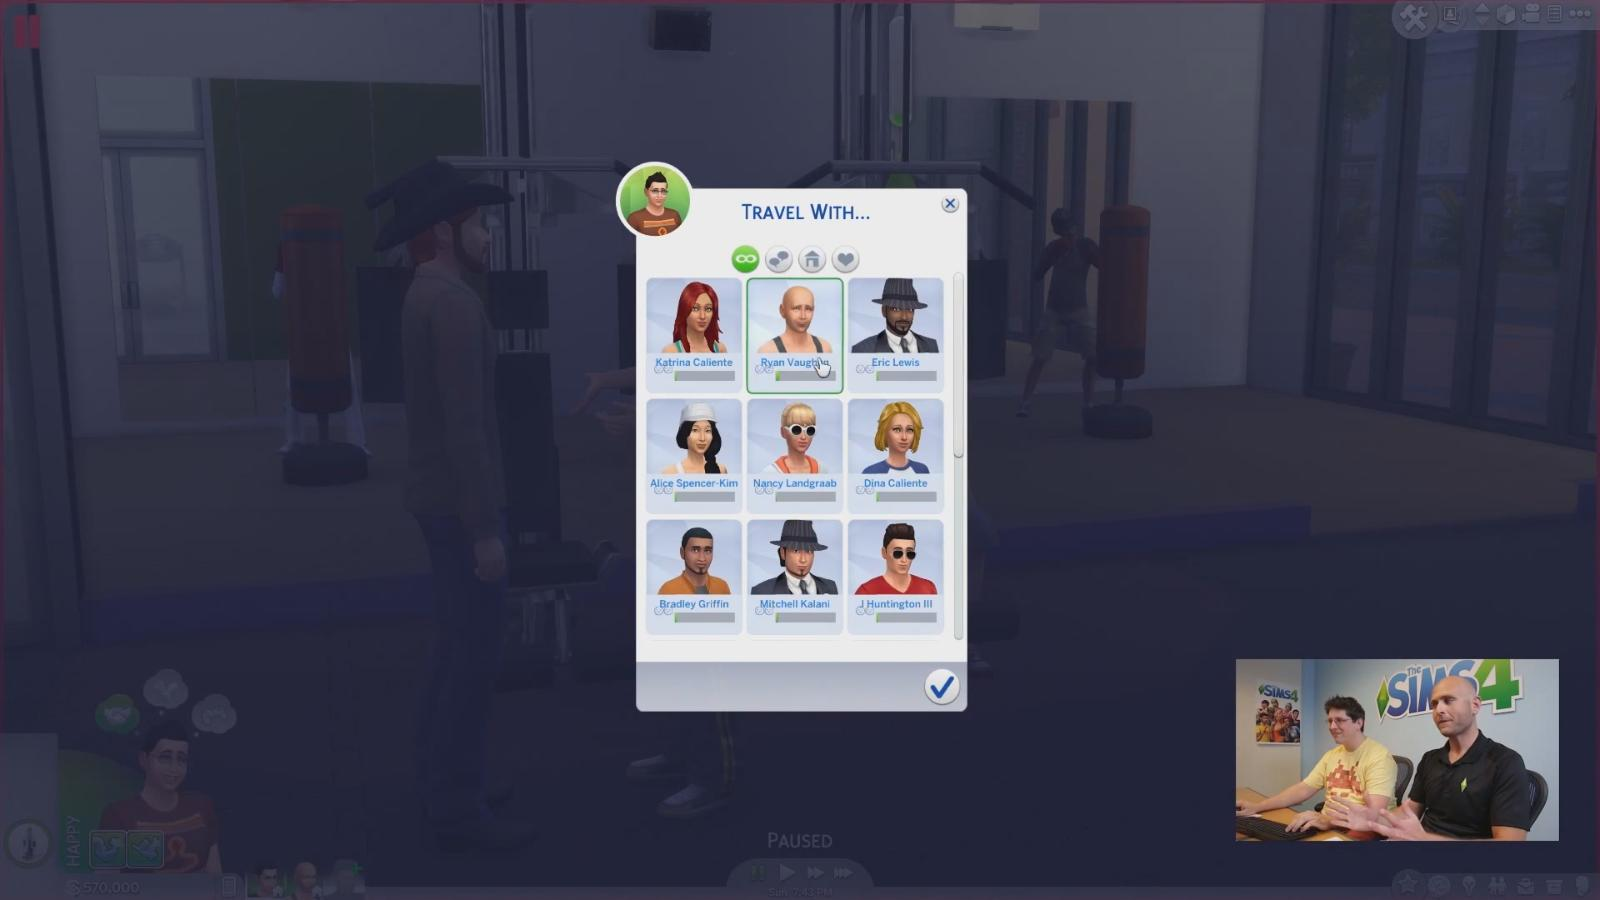 Sims 4 gameplay trailer fitnessstudio 108 for Sims 4 schwangerschaft cheat